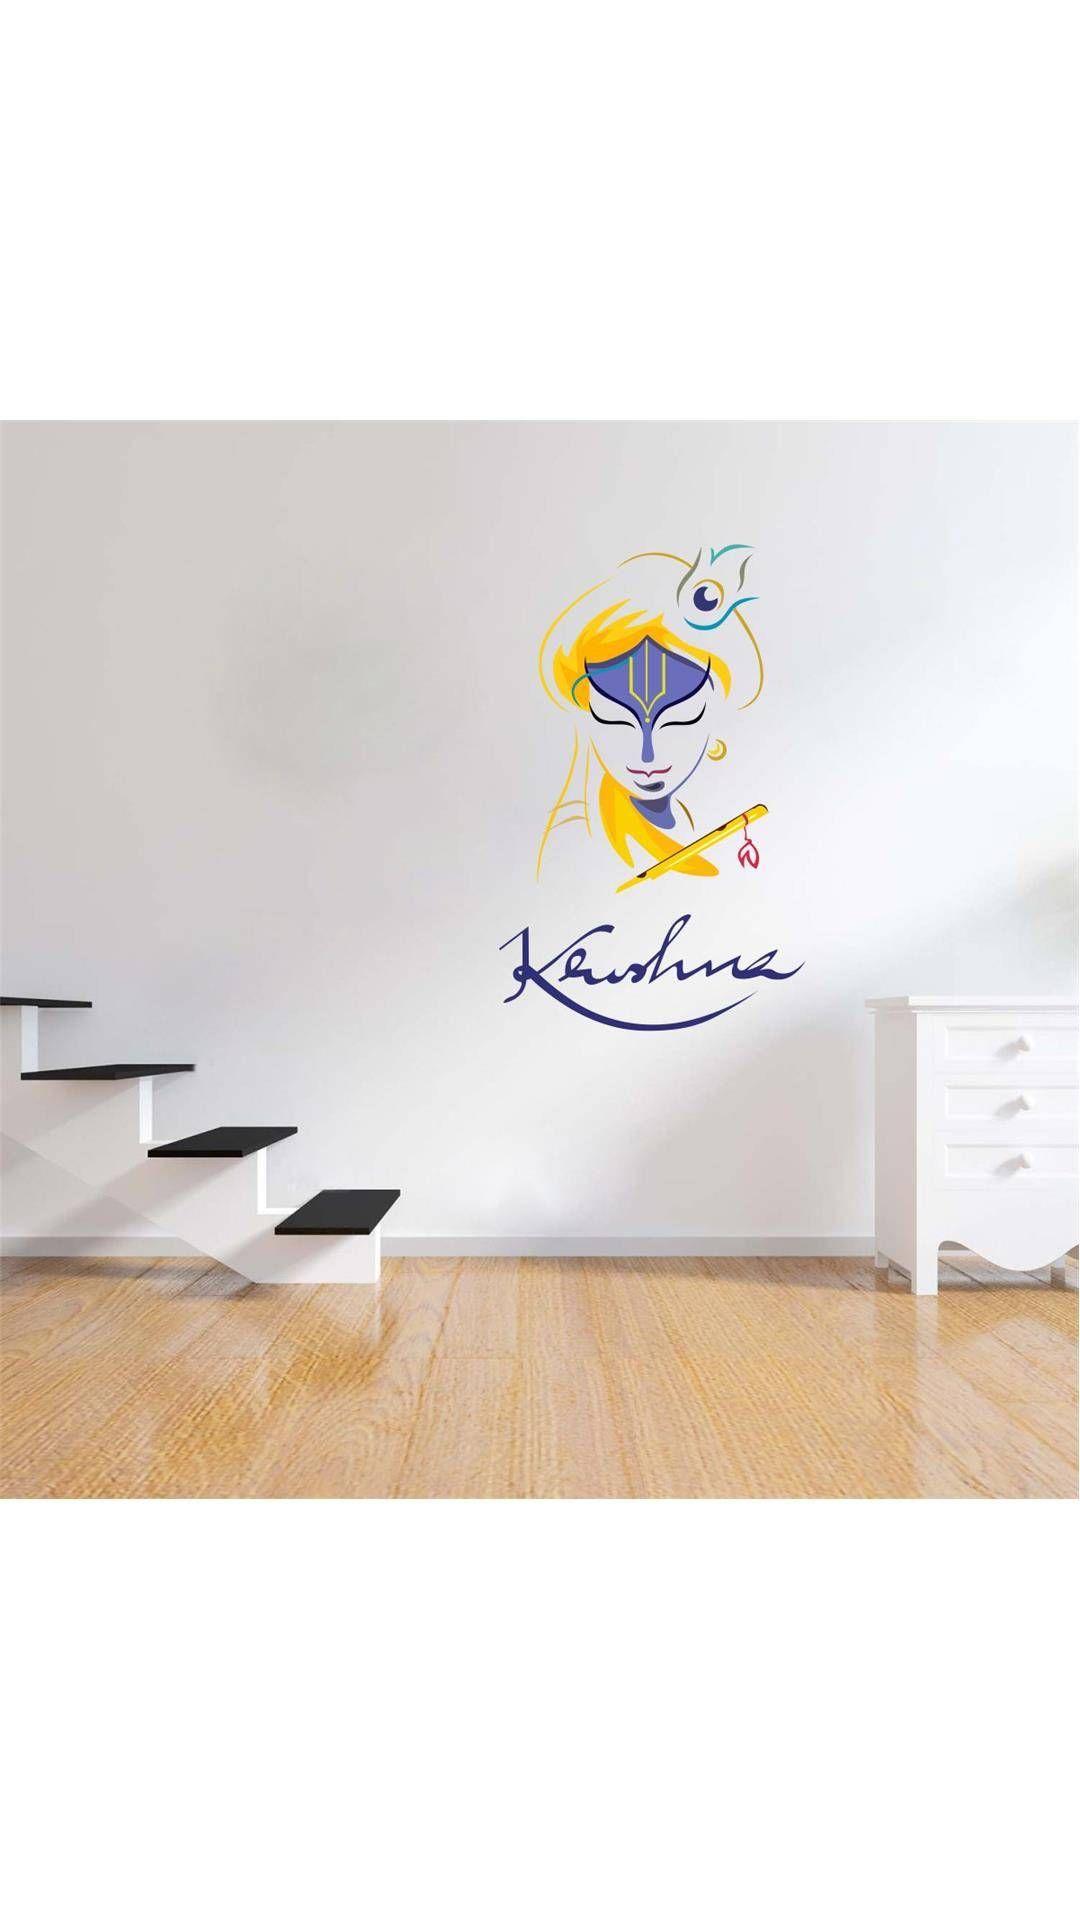 Paytmmall com buy wall sticker art krishnapvc vinyl3555 cm online at best prices in india on paytmmall com